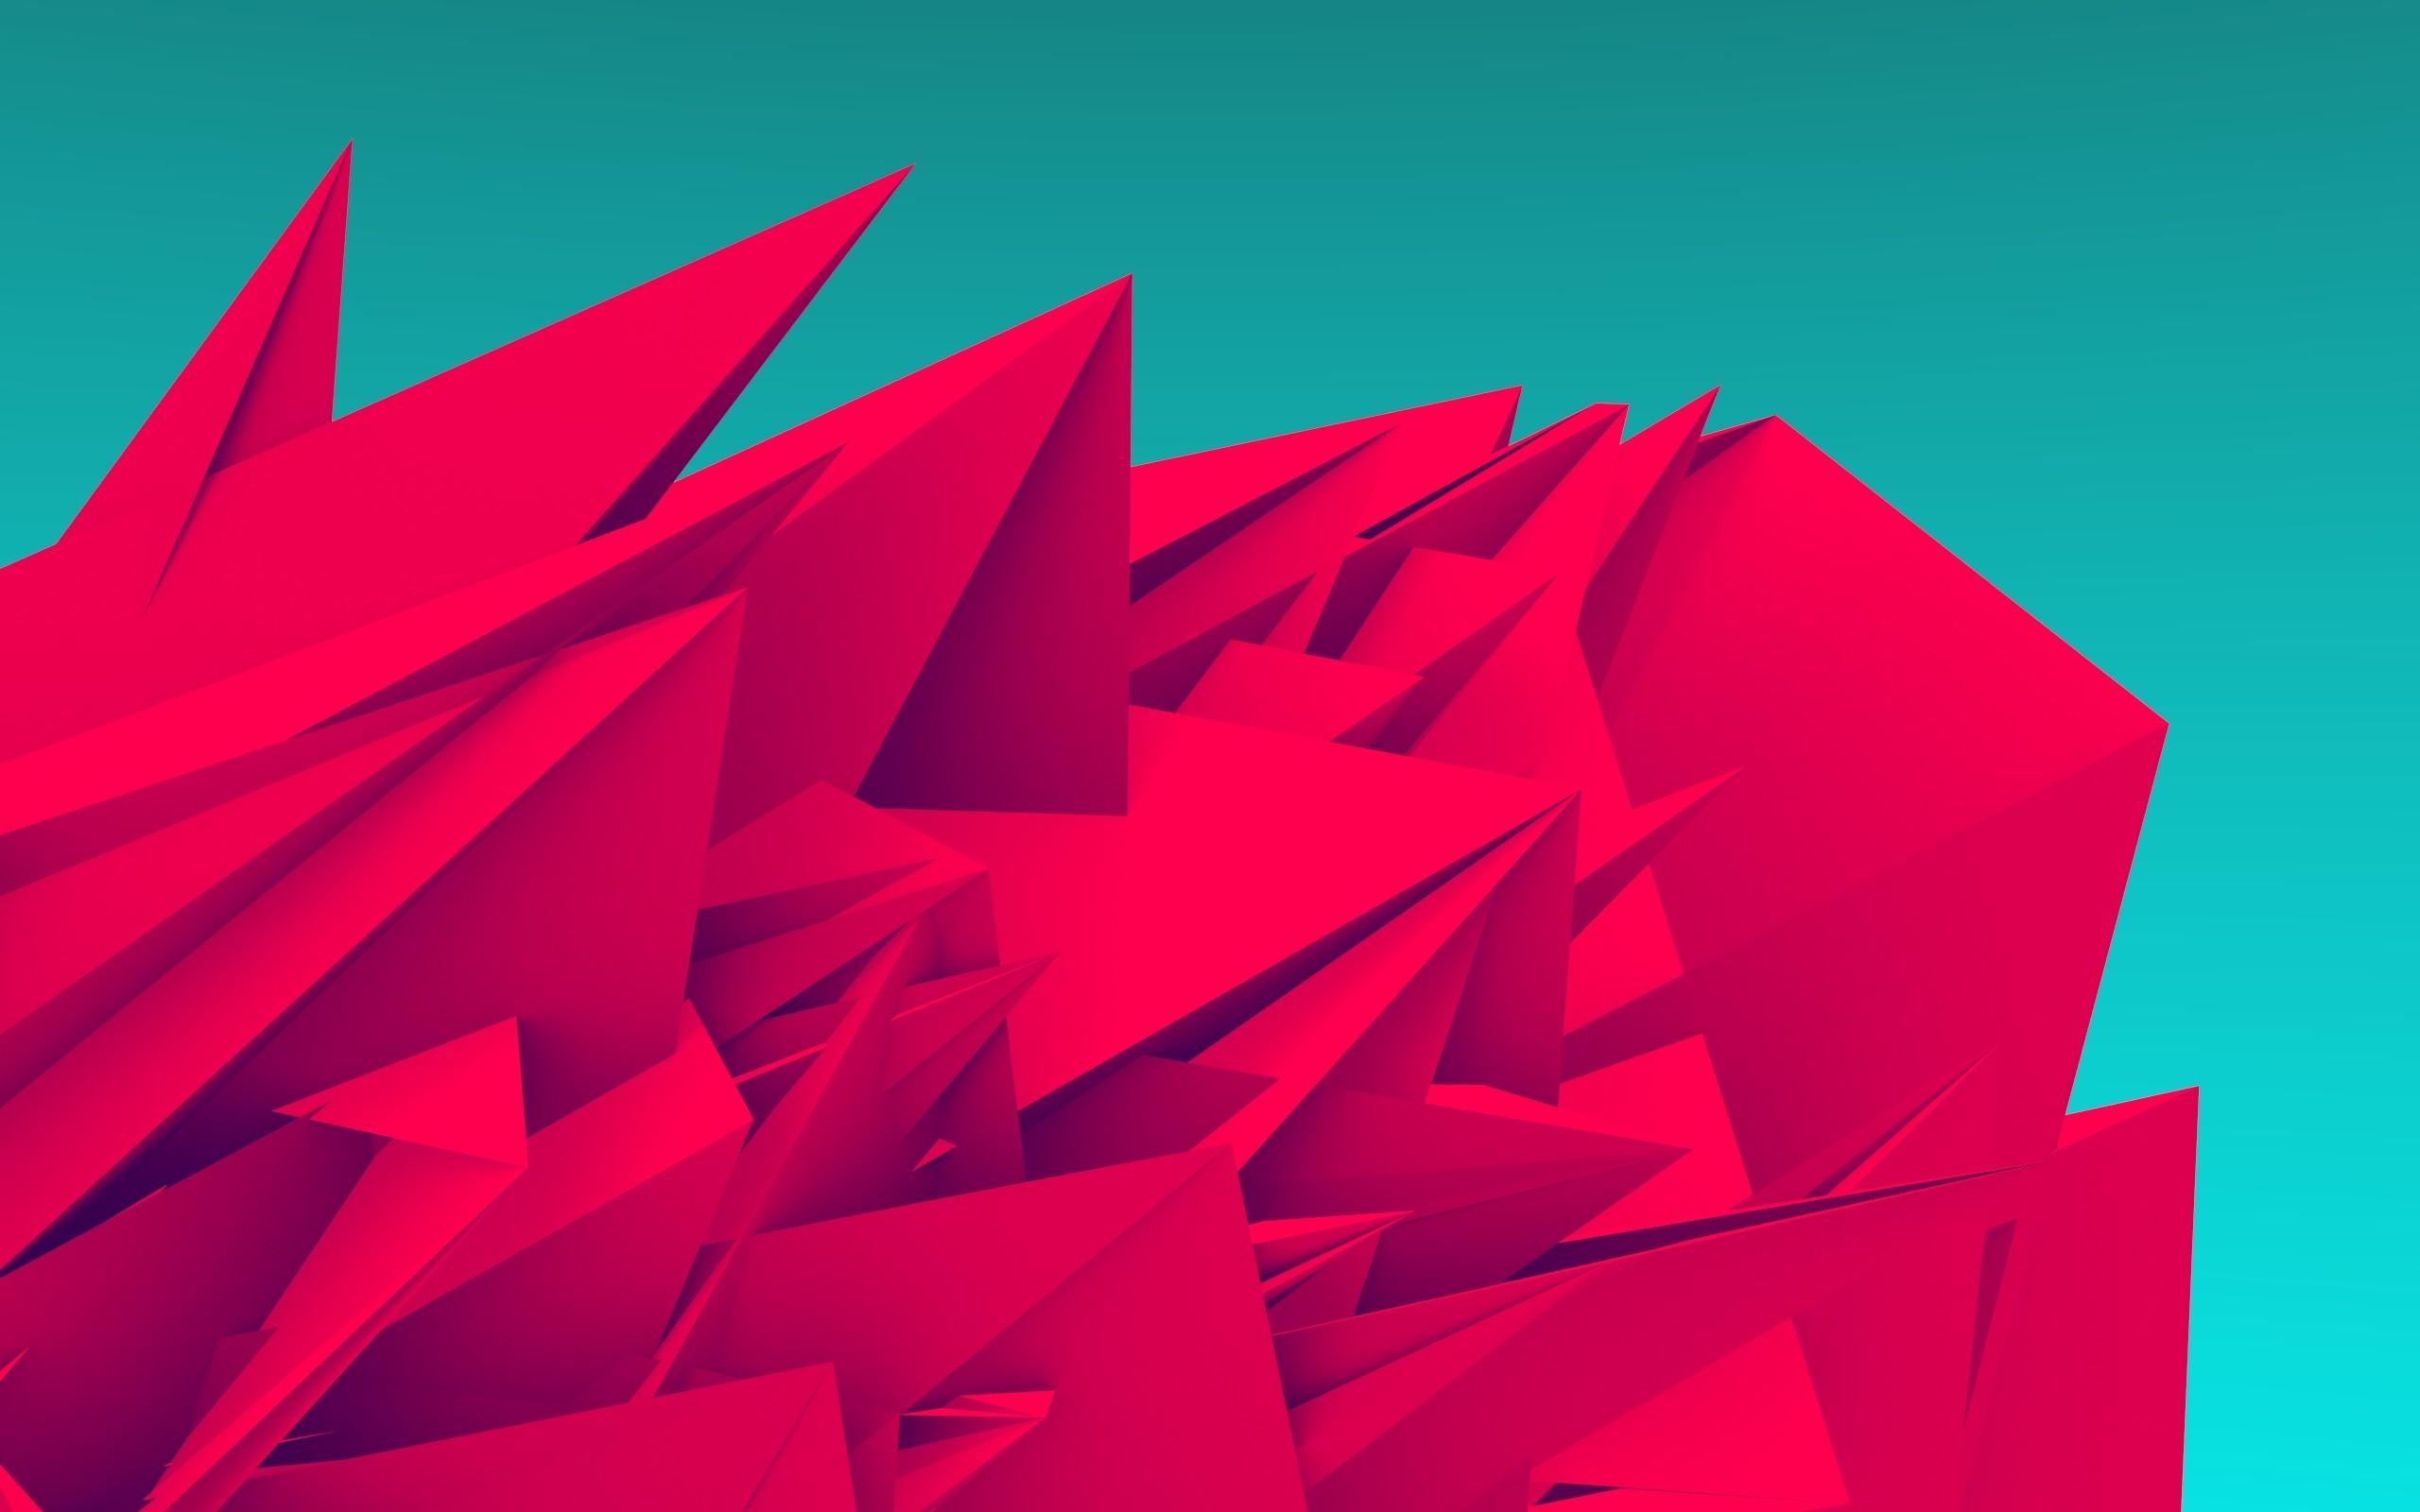 KuBiPeT HQ Backgrounds: Polygon, by Kristal Birdwell